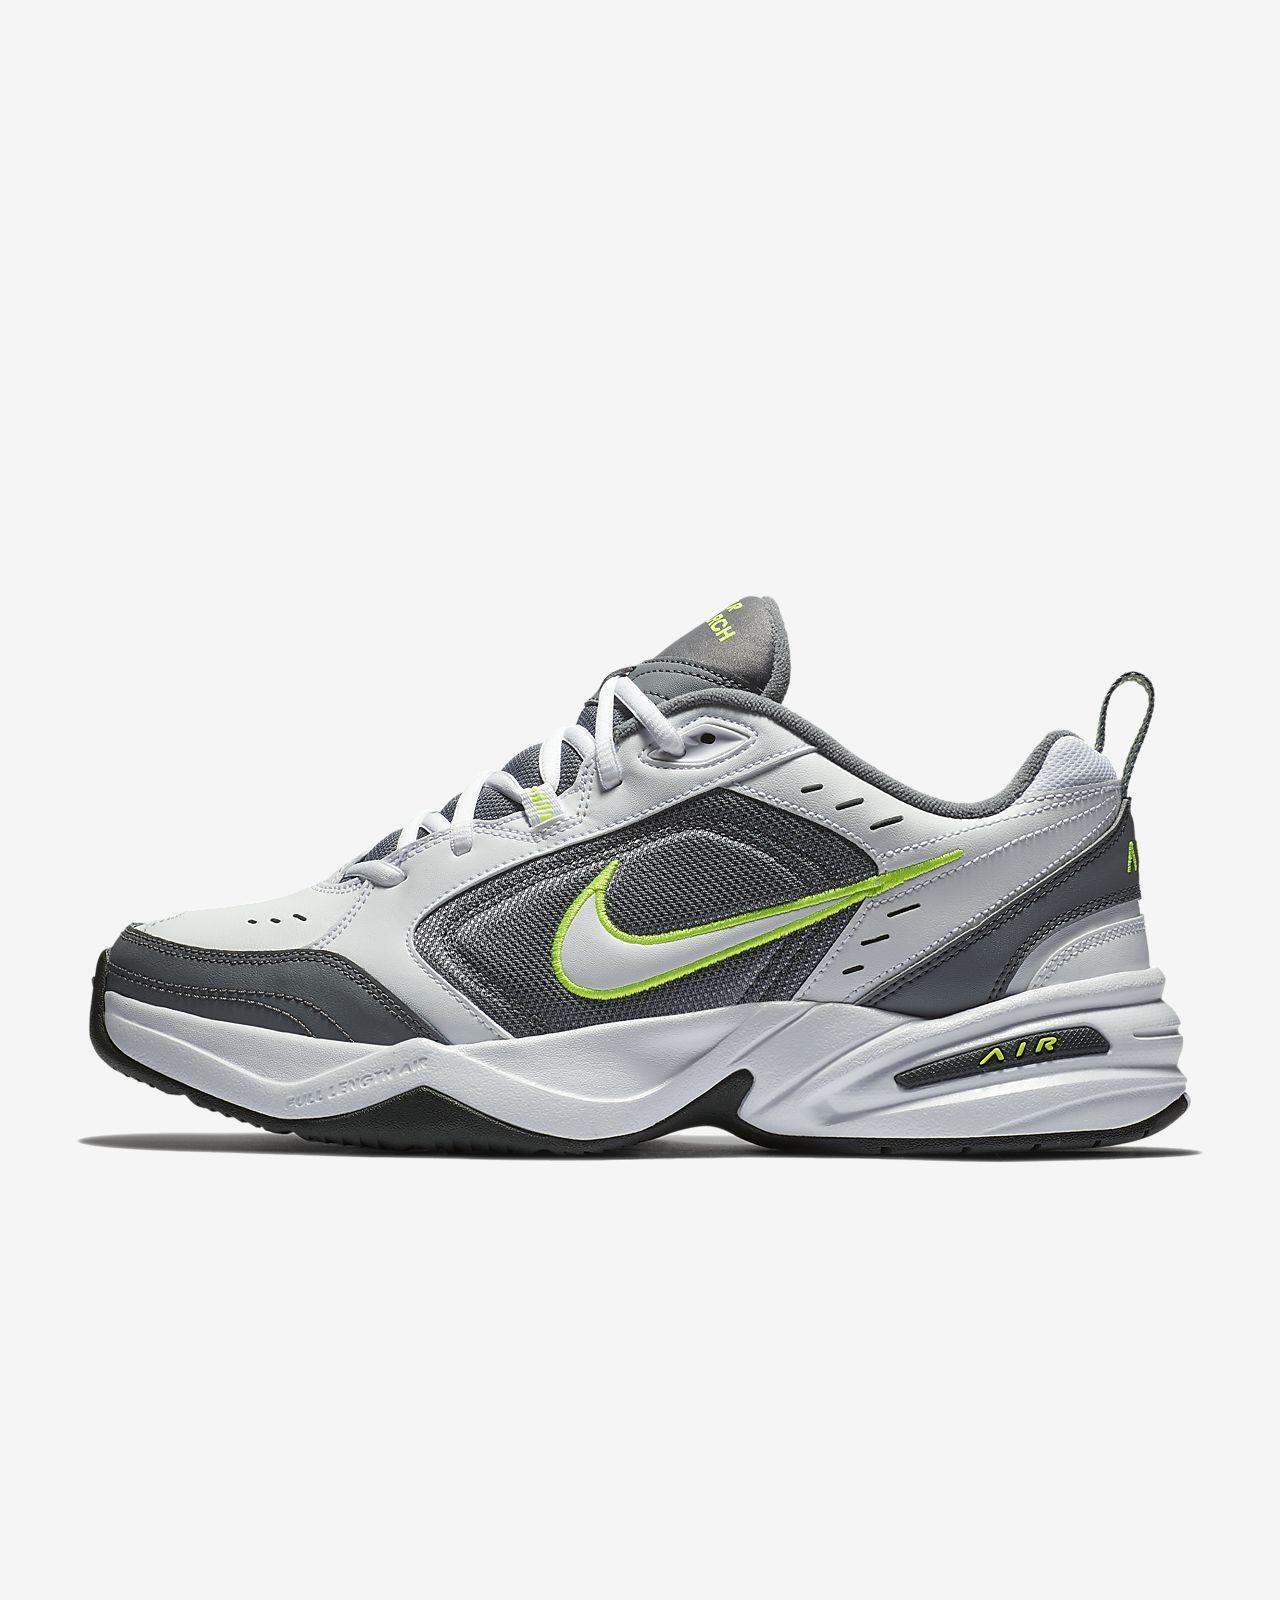 Nike Air Monarch IV Sabatilles de lifestyle i gimnàs